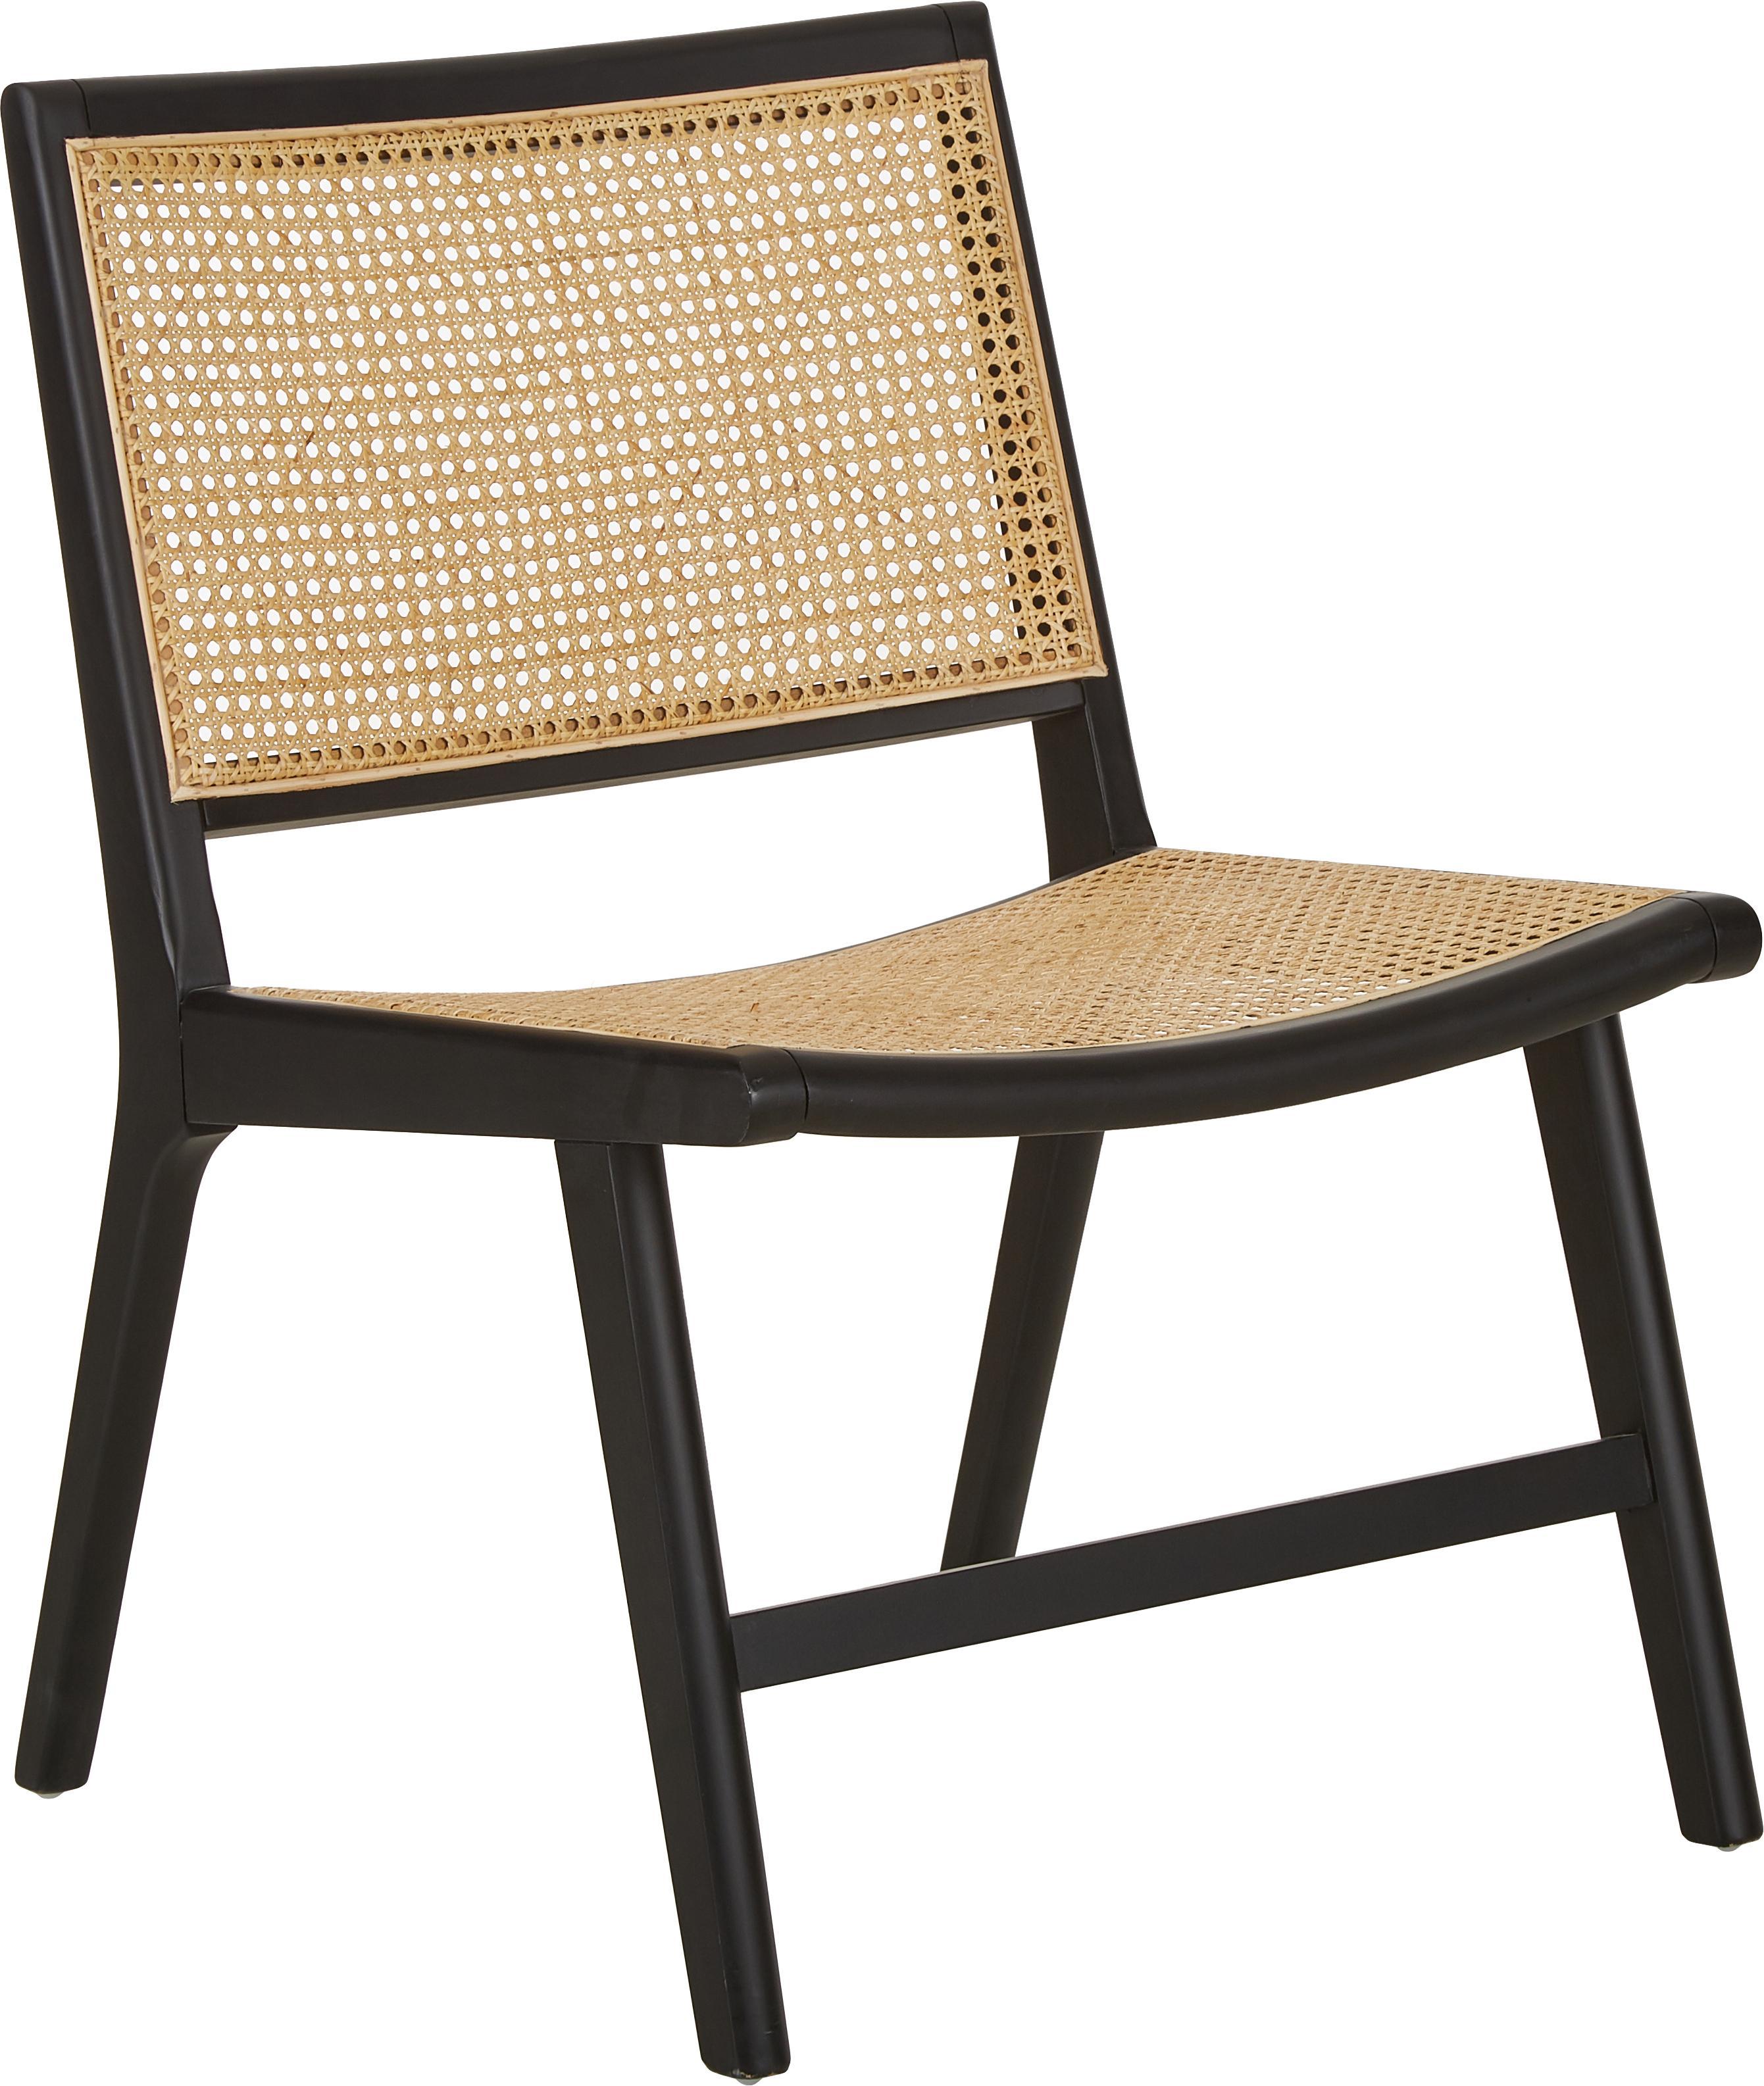 Loungesessel Franz mit Wiener Geflecht, Sitzfläche: Rattan, Gestell: Massives Birkenholz, lack, Sitzfläche: RattanGestell: Schwarz, lackiert, B 57 x T 66 cm